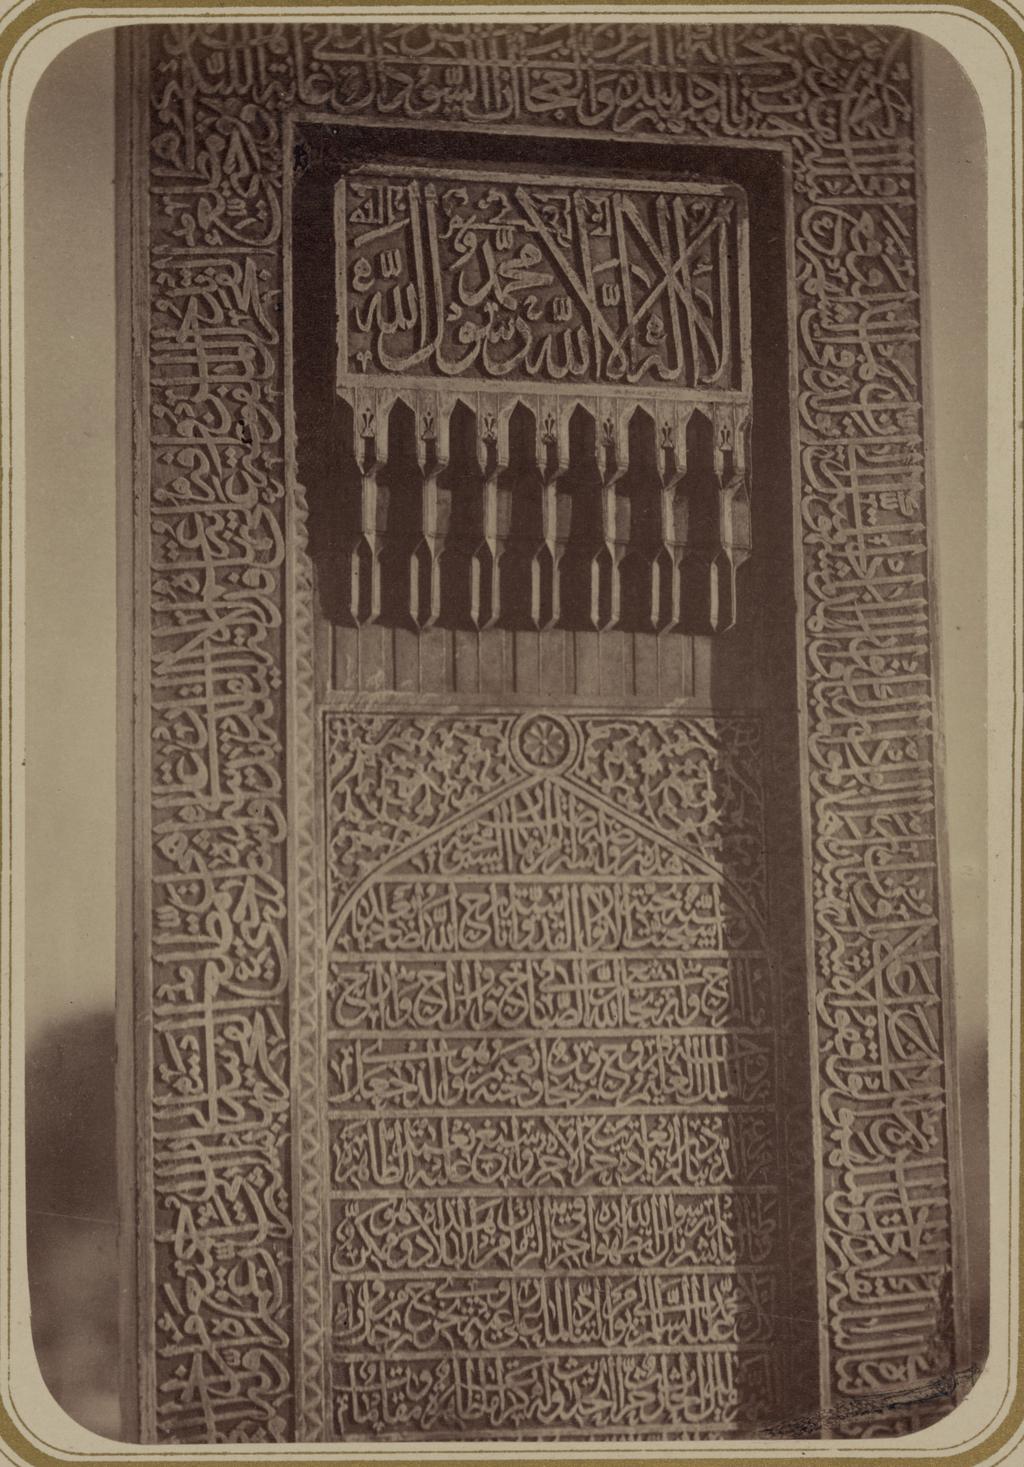 Мечеть Ходжа Ахрар. Верх. Надпись на надгробном камне на могиле Ходжа Ахрара